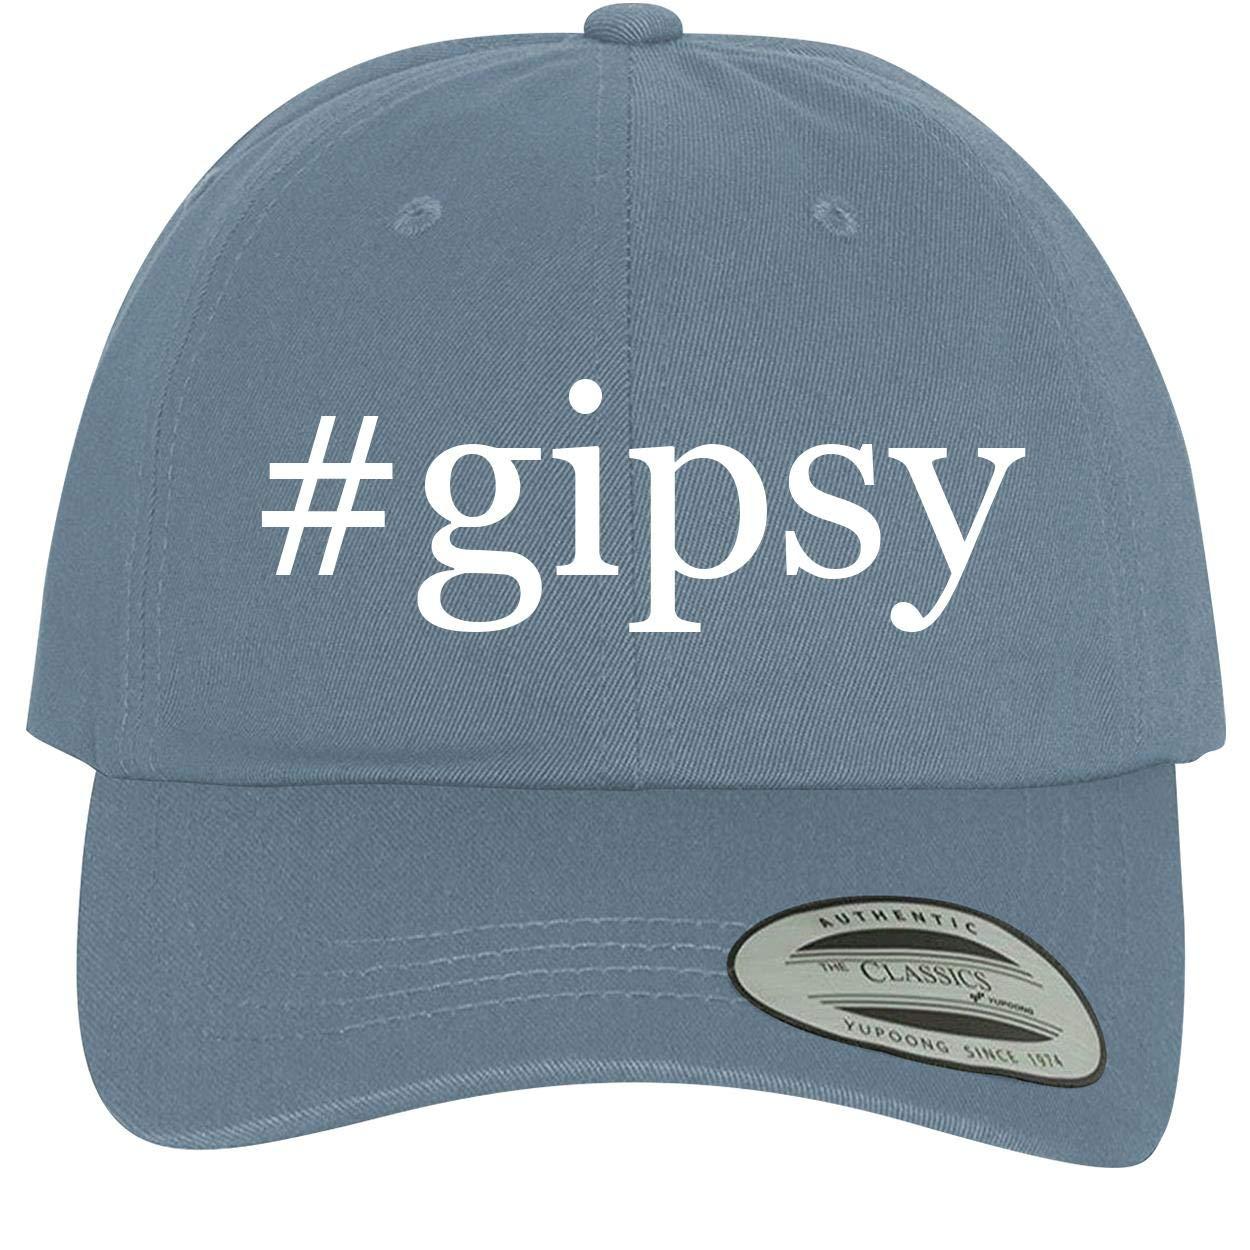 BH Cool Designs #Gipsy Comfortable Dad Hat Baseball Cap